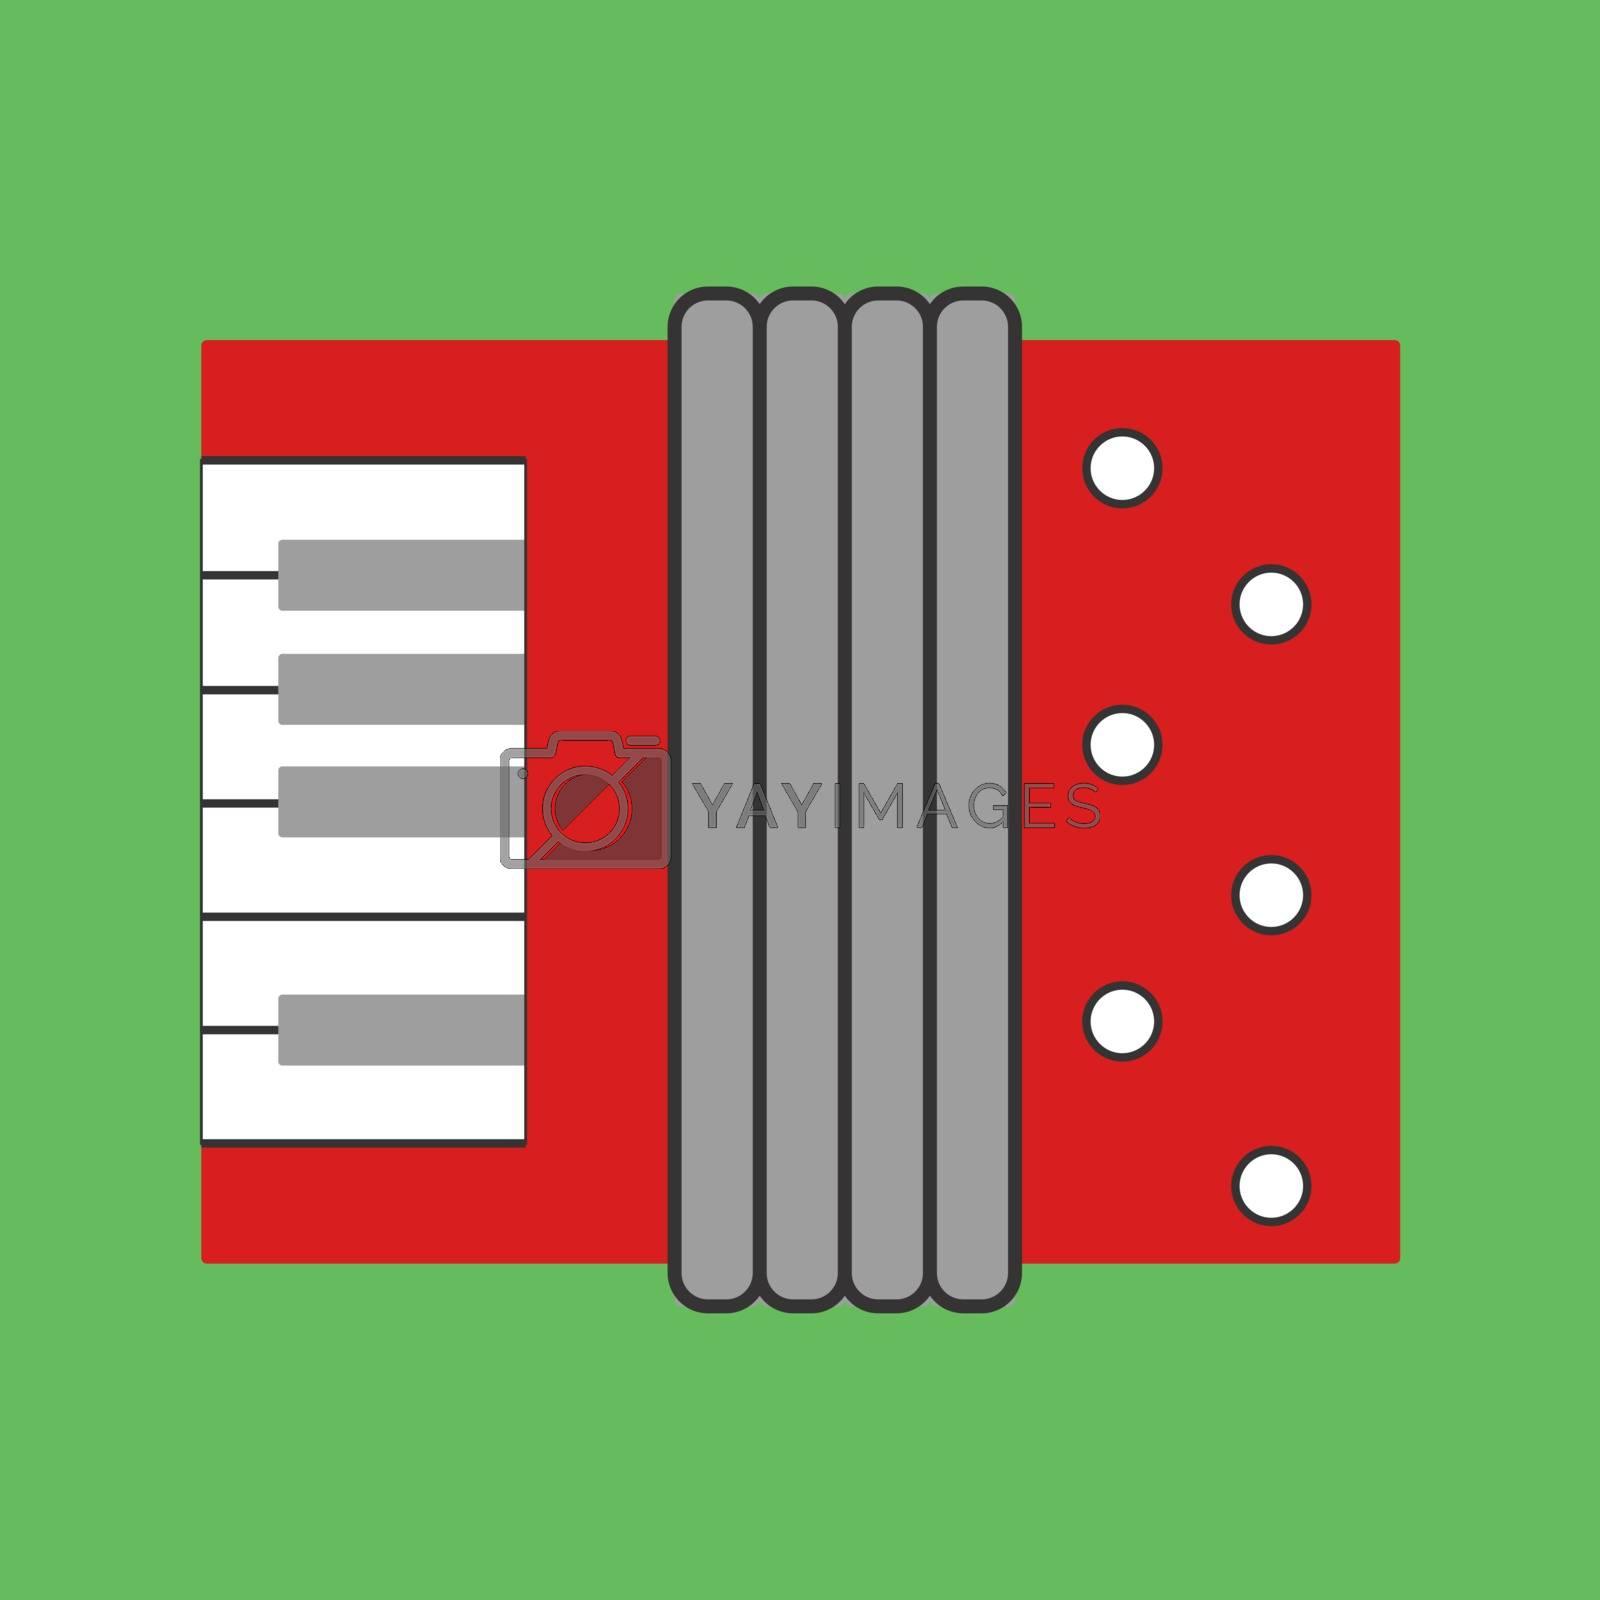 Harmonic, illustration, vector on white background.